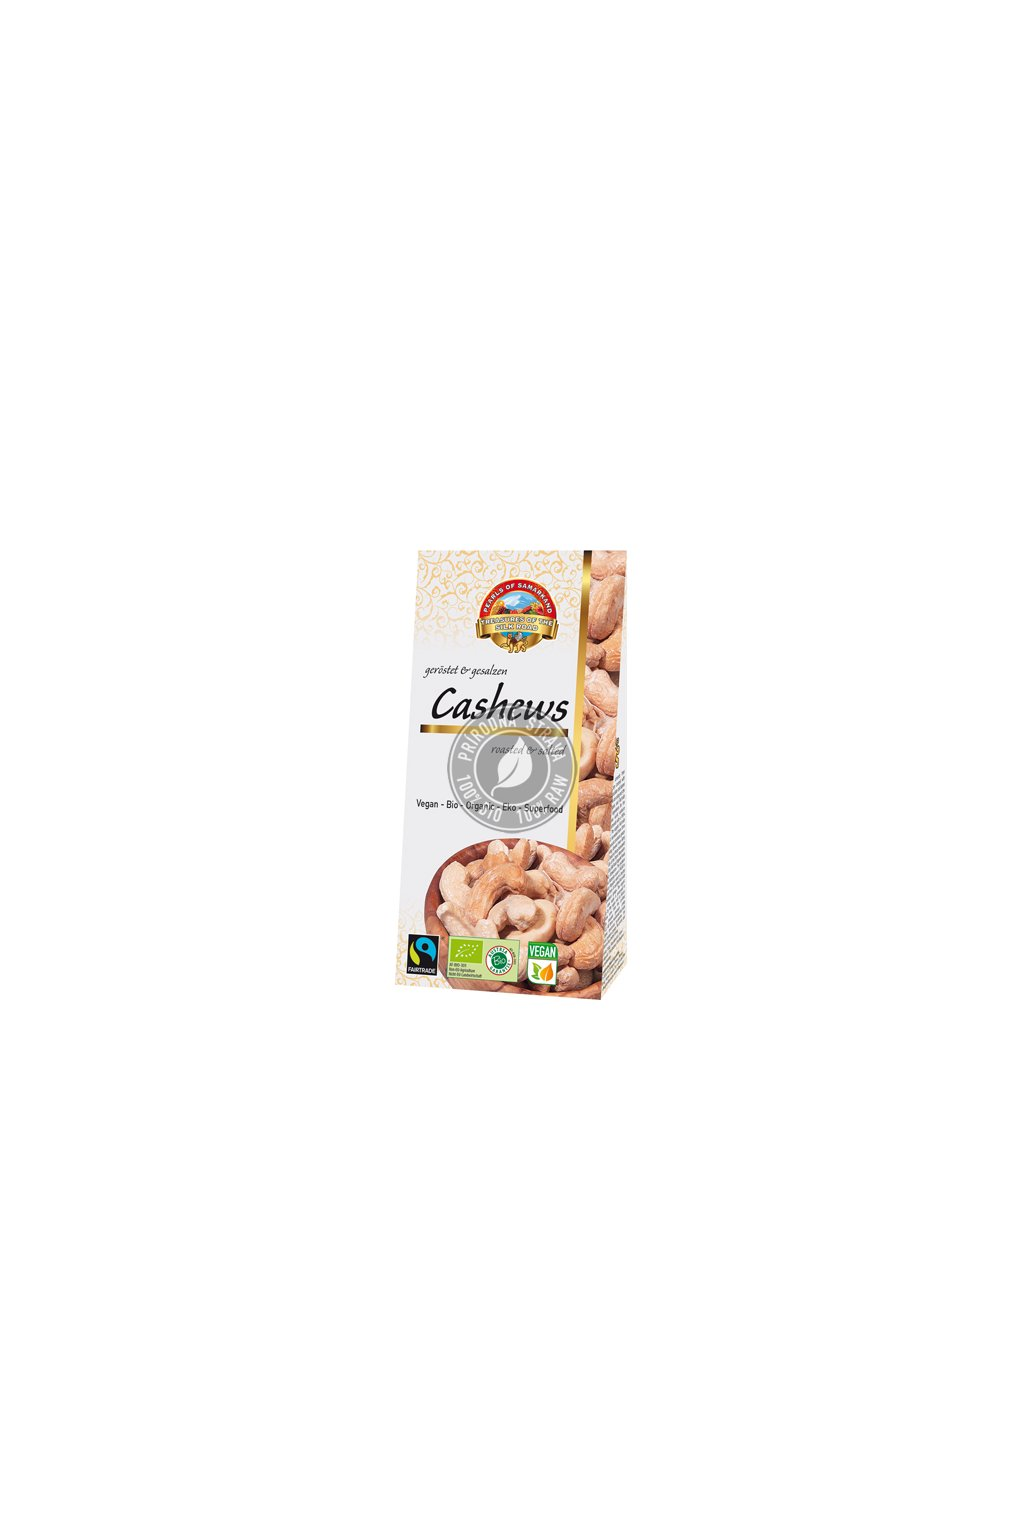 Pearls Kešu pražené a solené BIO Fairtrade - 70g